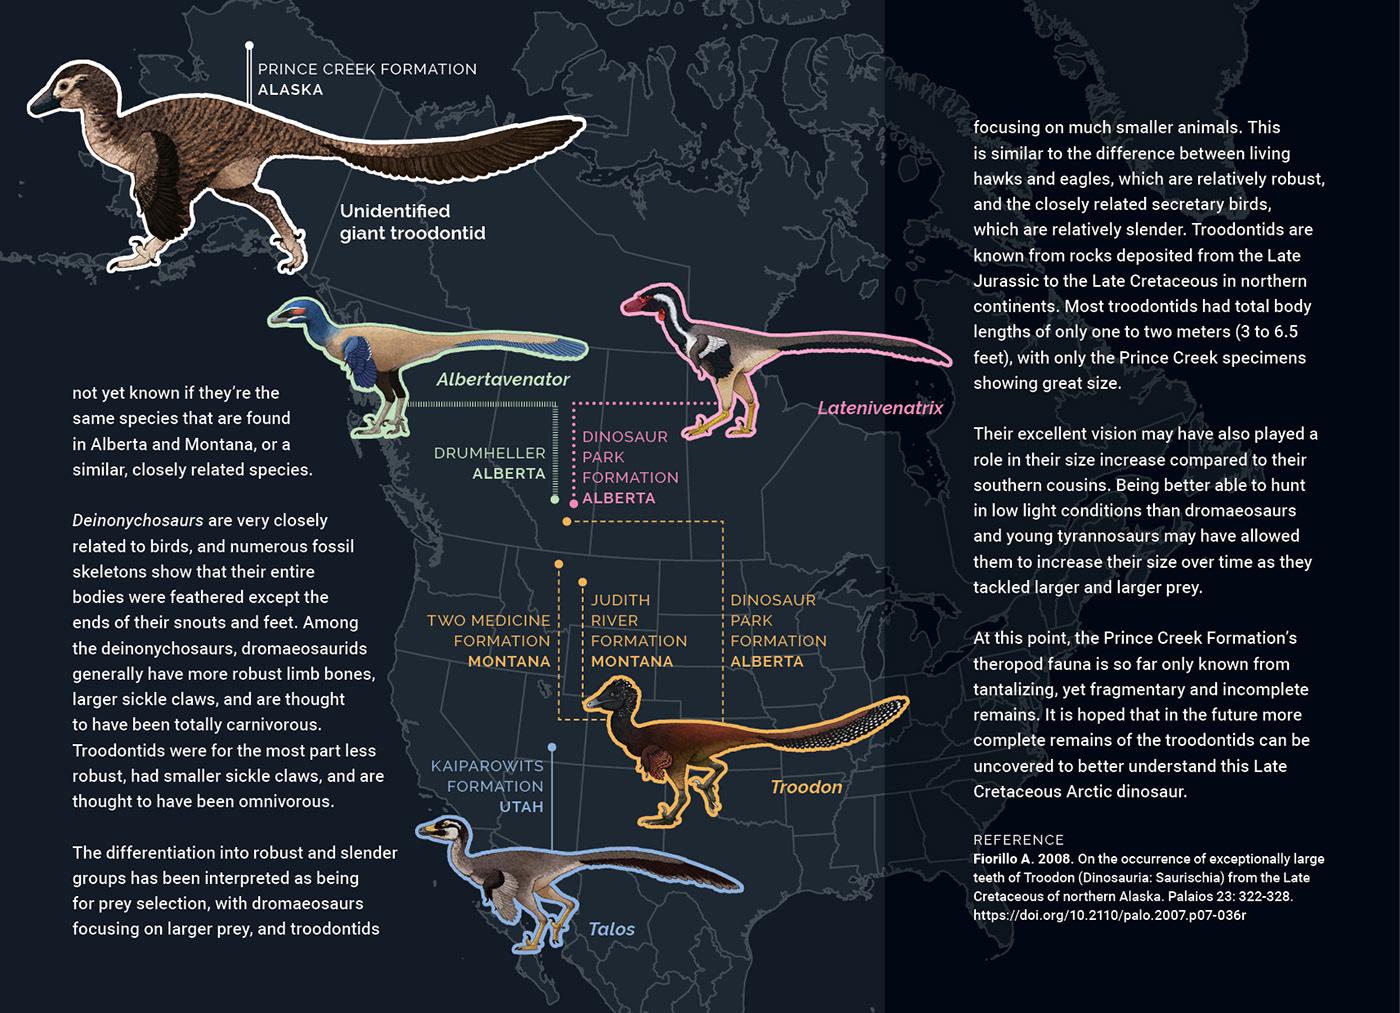 Dinosaur paleontology paleoart science scientific illustration raptor animal bird creature Fossil